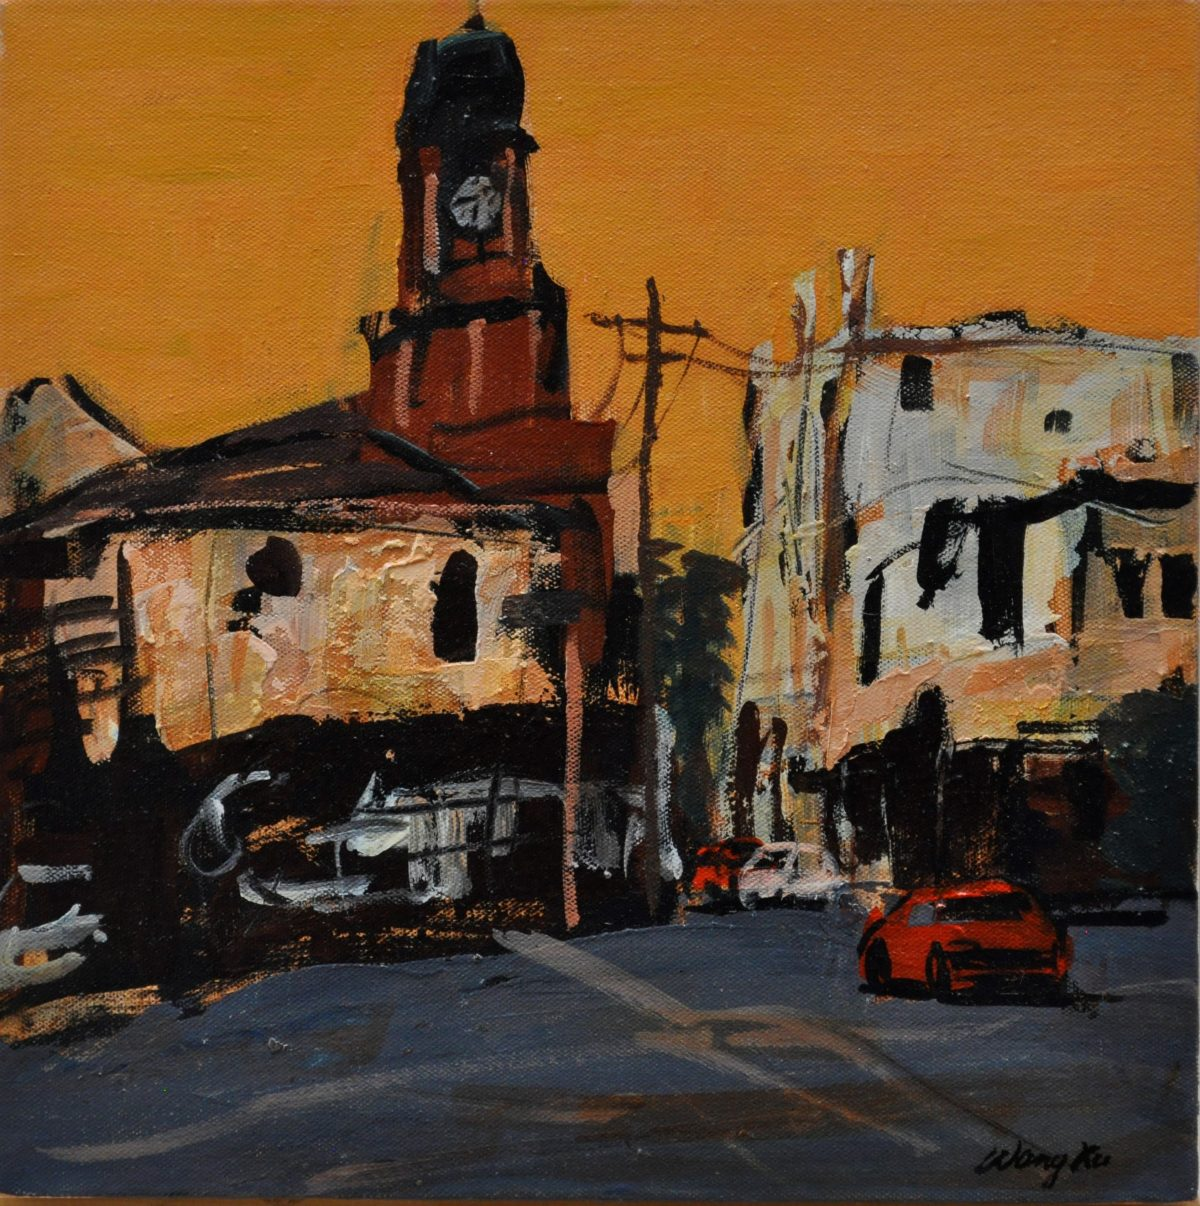 Contemporary Art, Australian Art, Sydney Art Gallery, Chinese Australian Artist, Art and Design, Art Exhibition, Art Gallery, Art, Art Atrium, Landscape, Urban Landscape, Cityscape